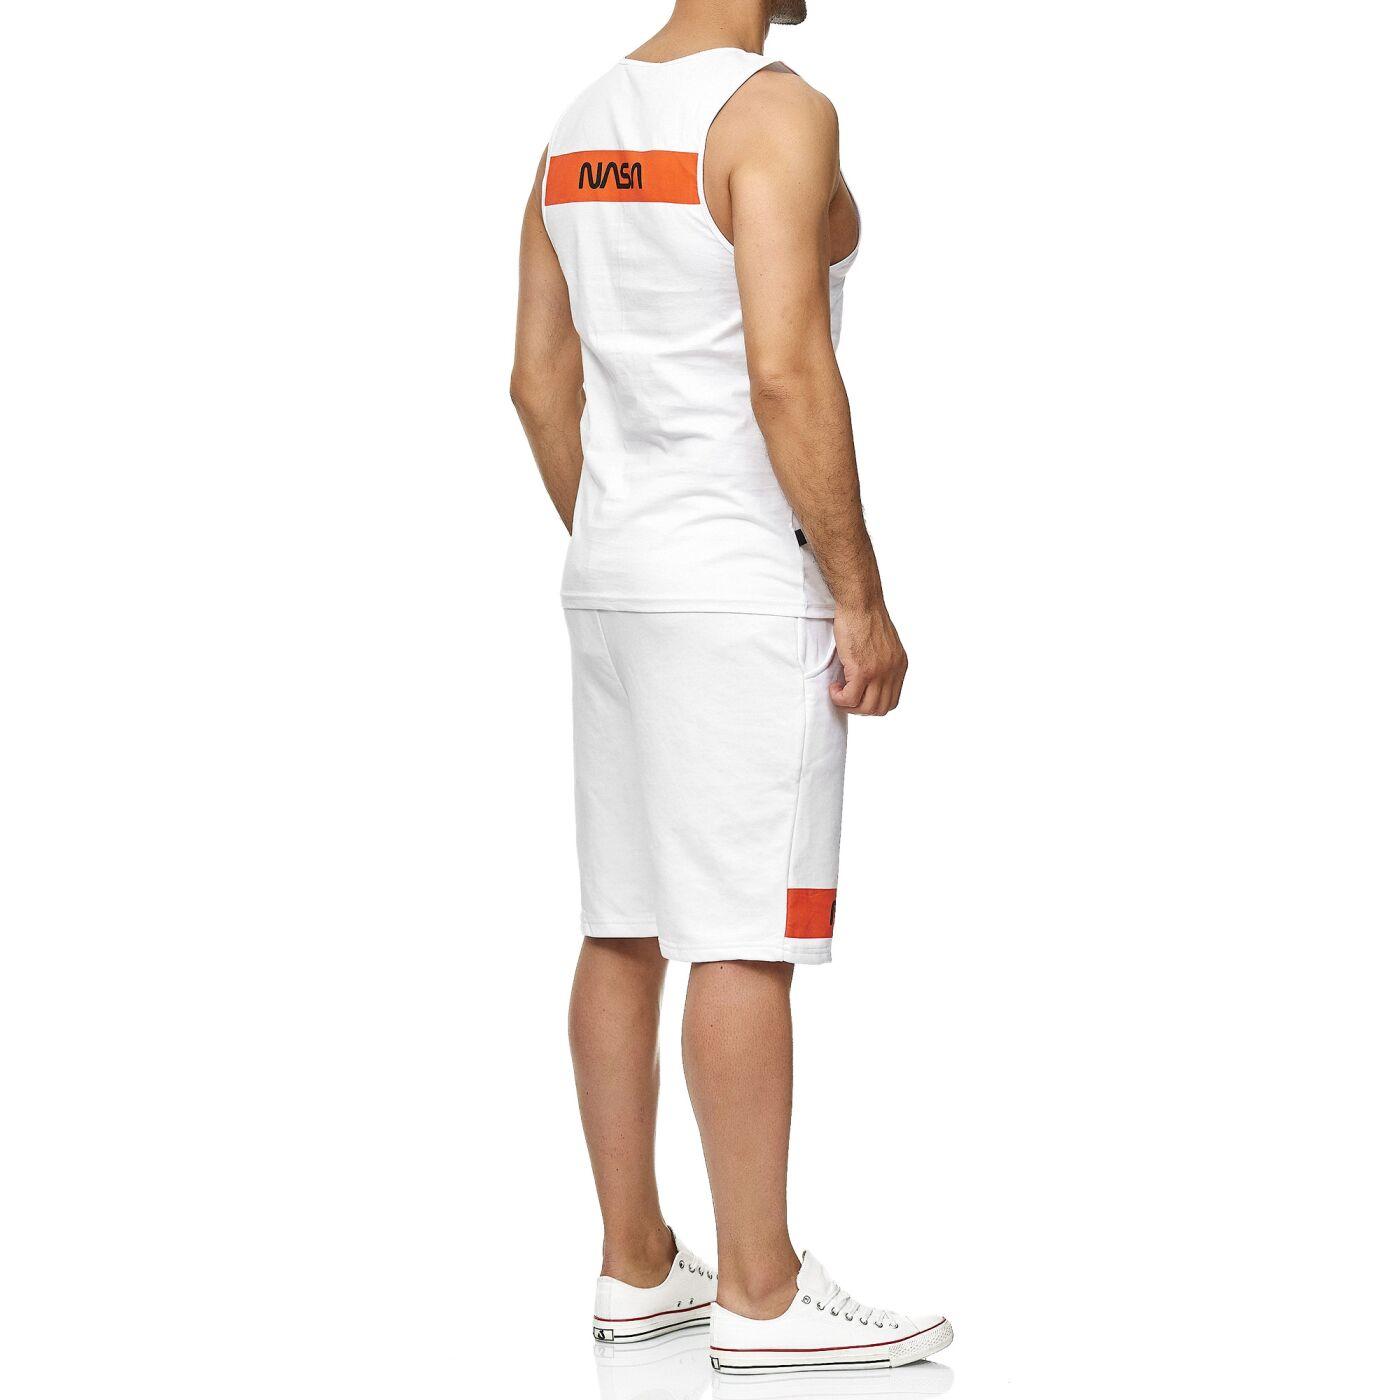 304949ee1c3176 Red Bridge Herren Tank Top und Shorts Jogginganzug Kurze Hose Set NASA Logo